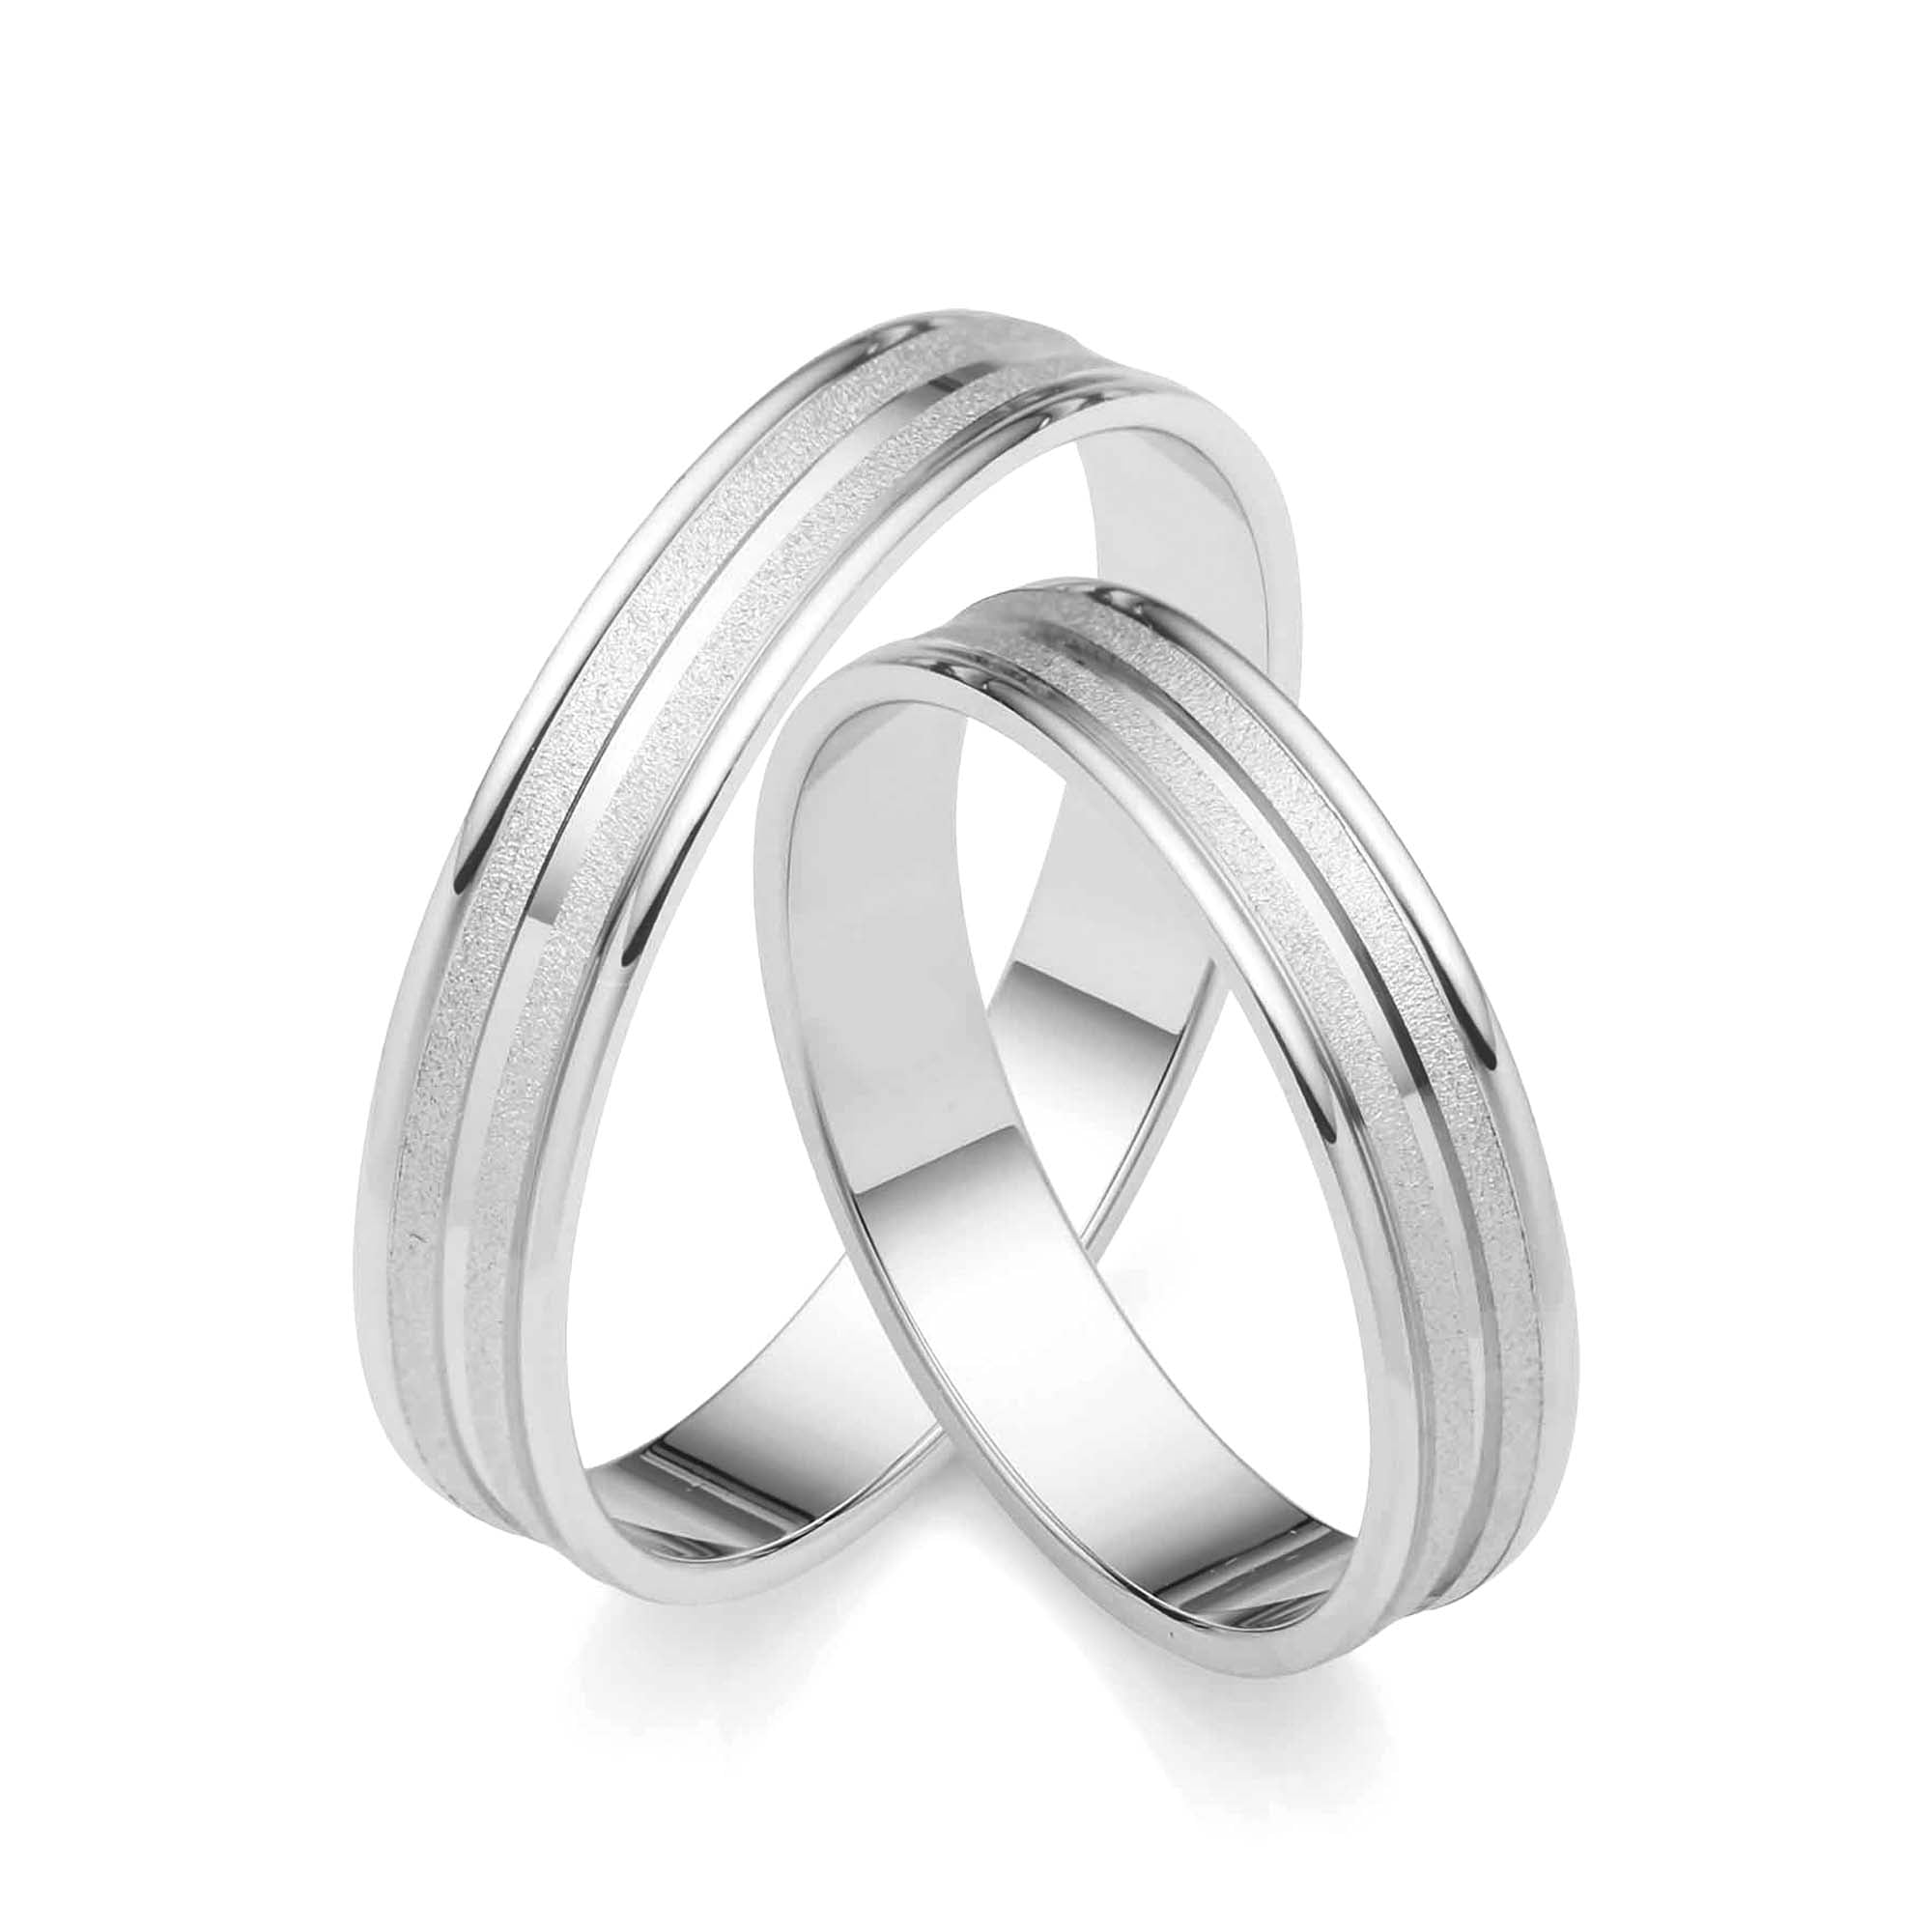 Juwelier Kraemer Freundschaftsringe 925 Silber 51 Mm Juwelier